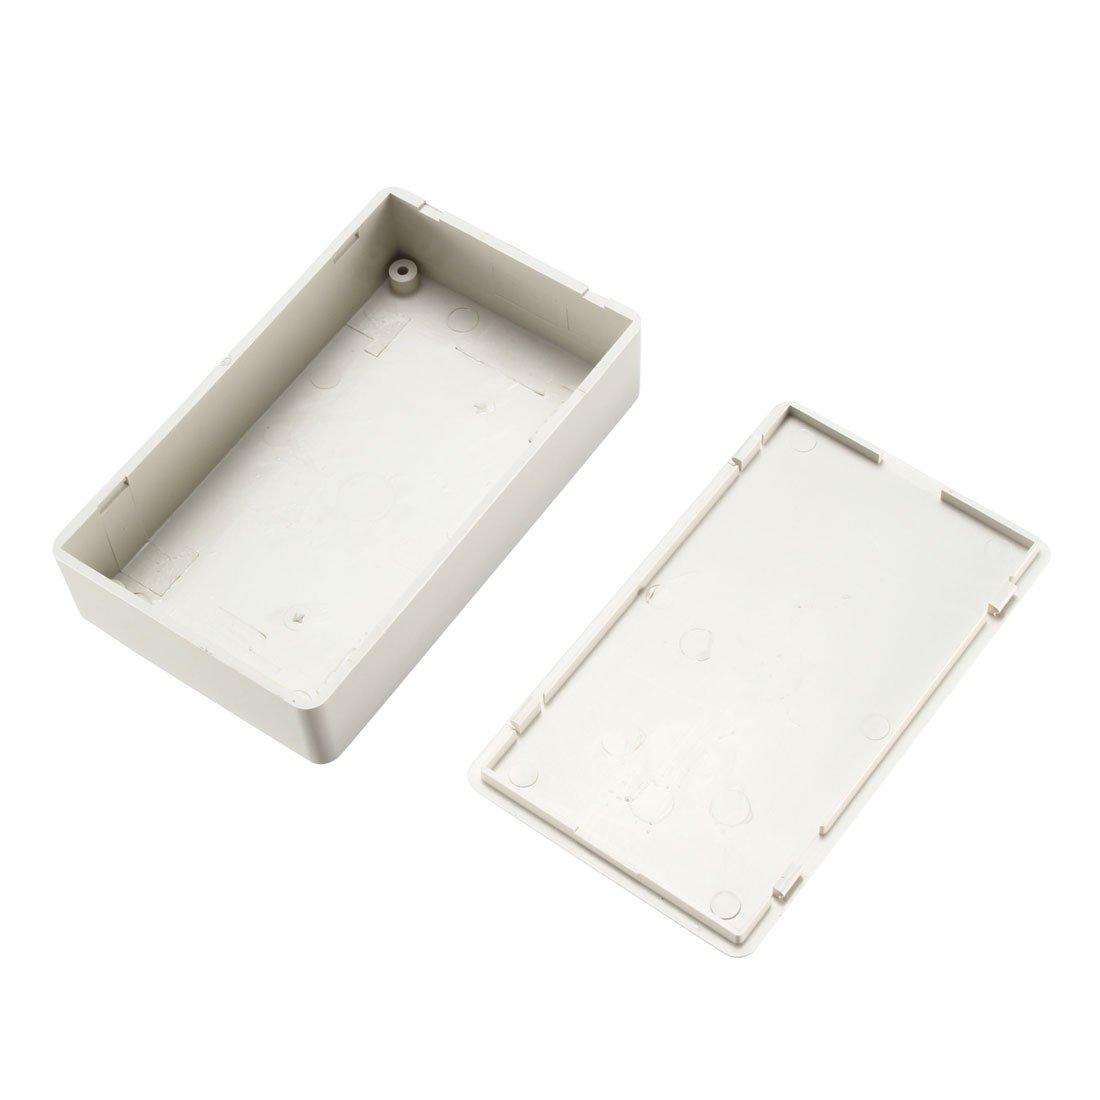 sourcing map DIY Junktion Box 40 x 20 x 11mm Elektro Plastik geschlossen Deckel Schwarz Farbe